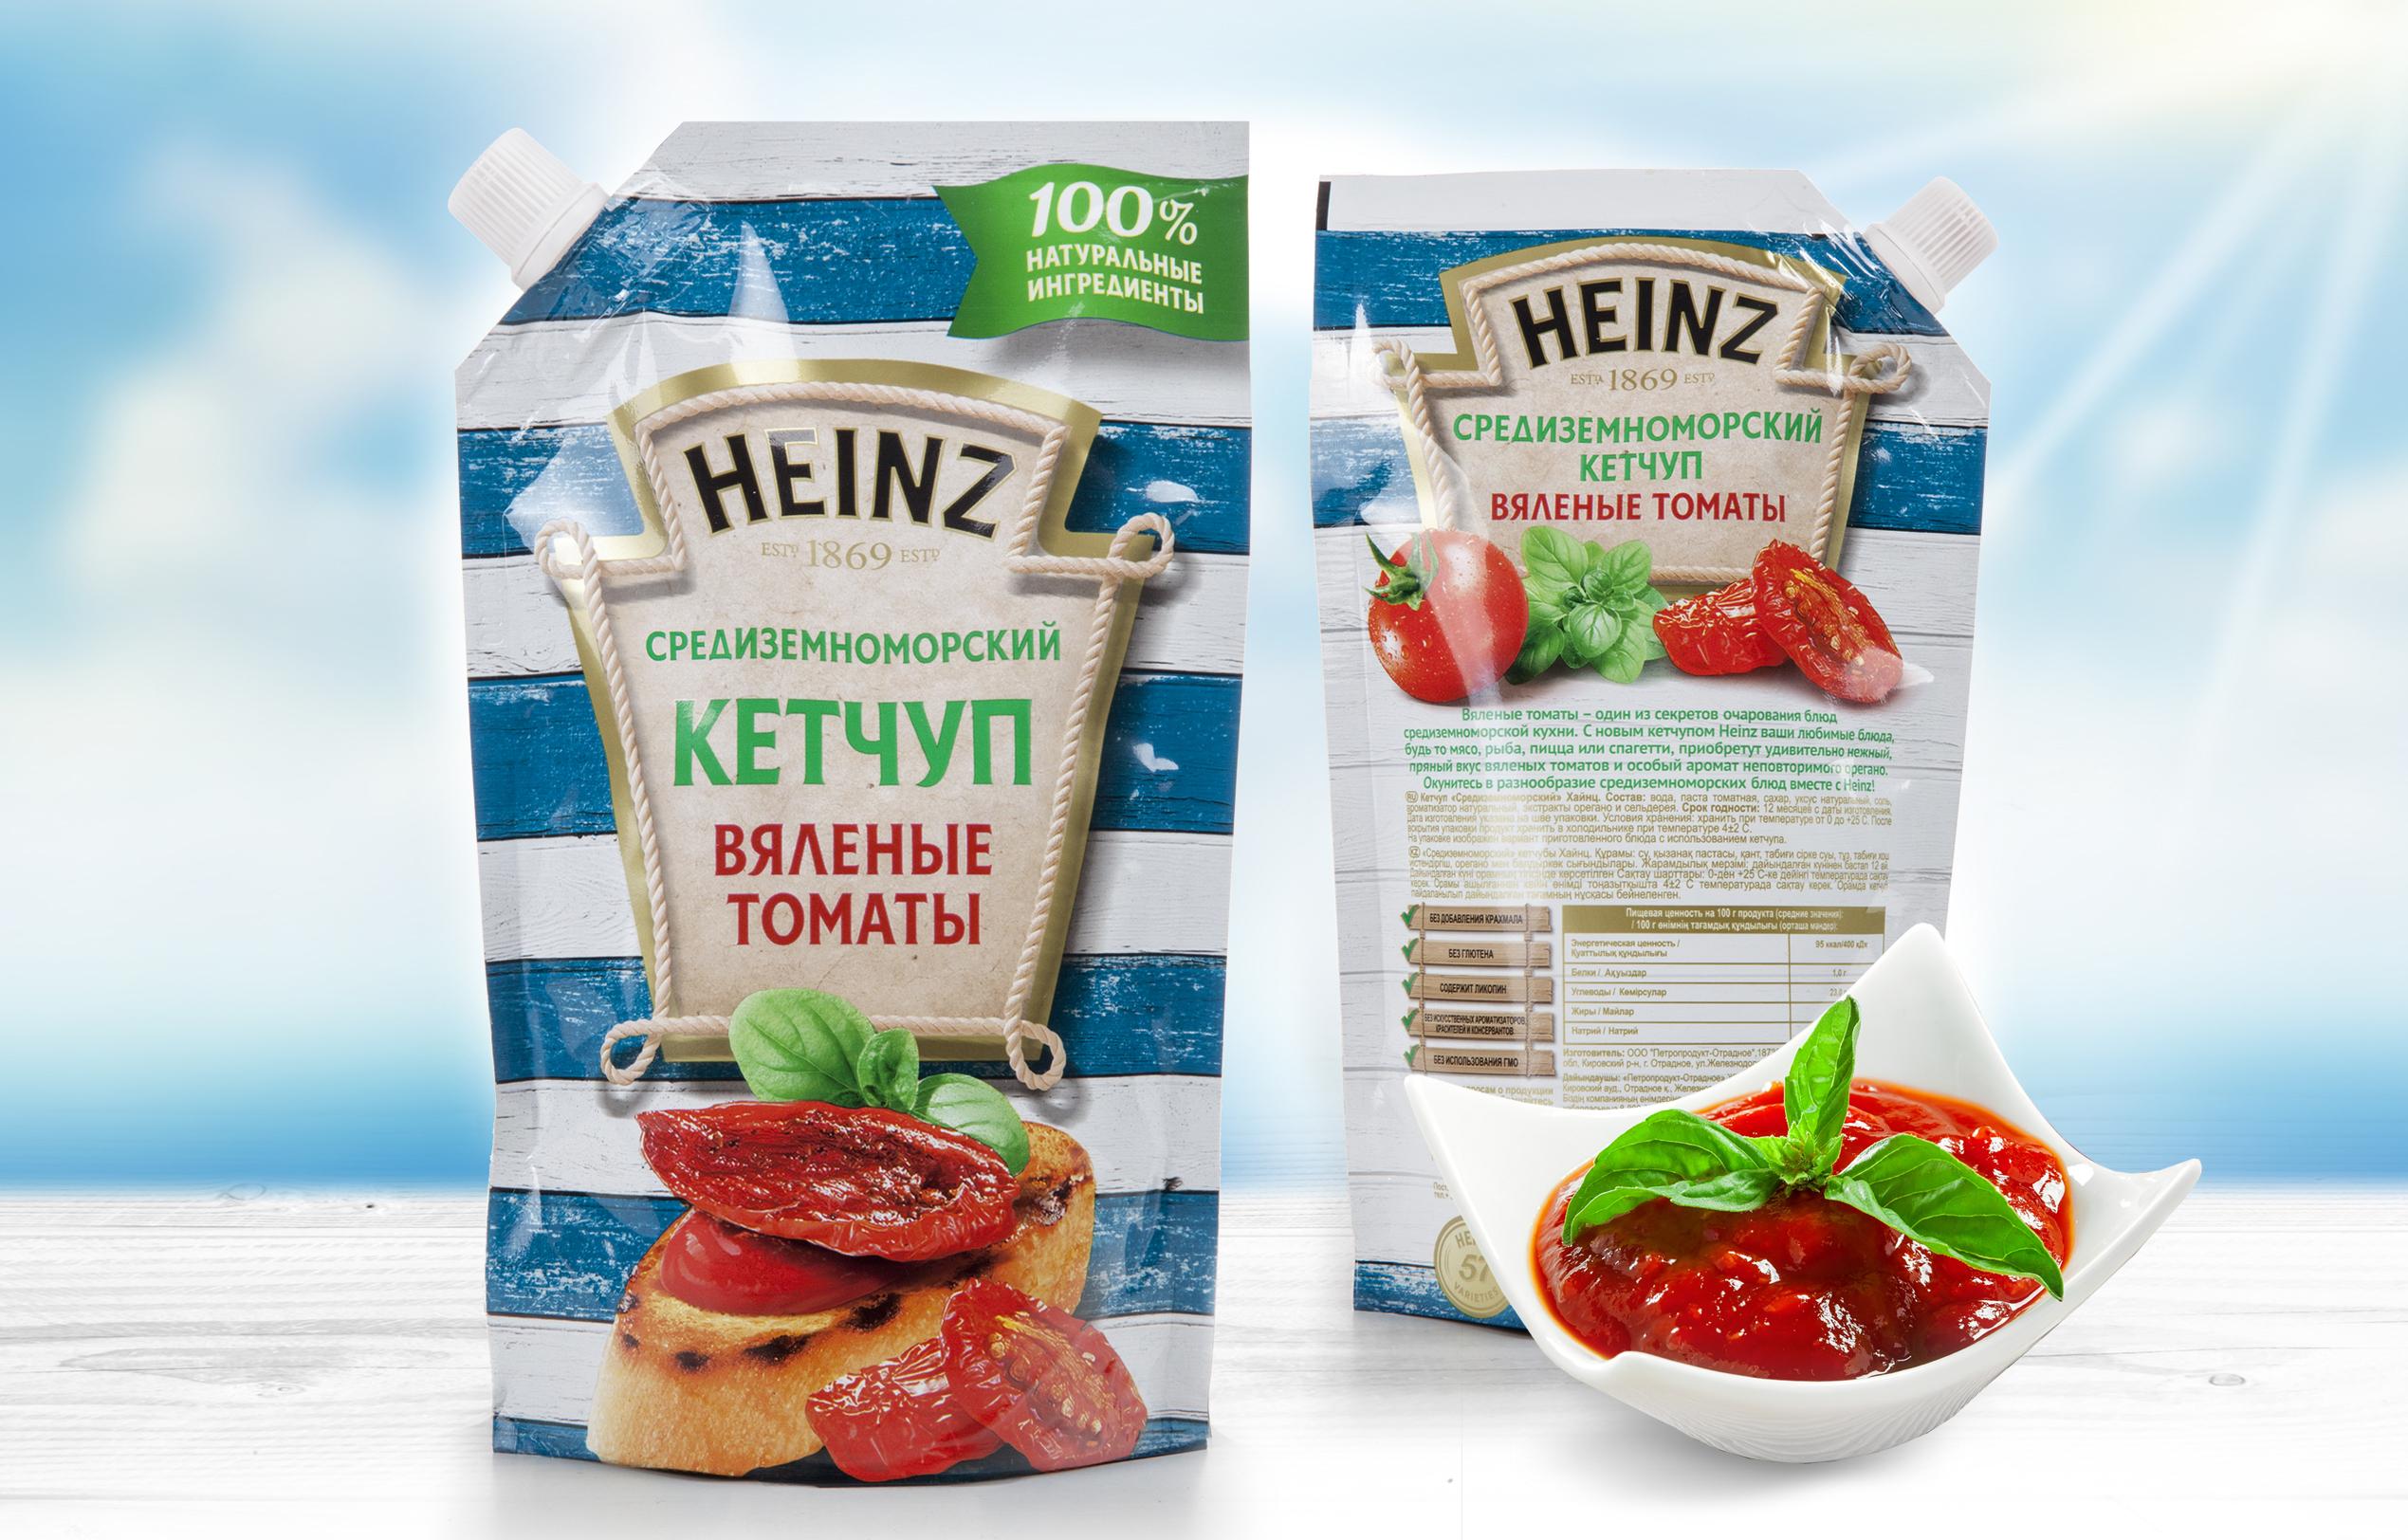 Рецепт приготовления кетчупа хайнц